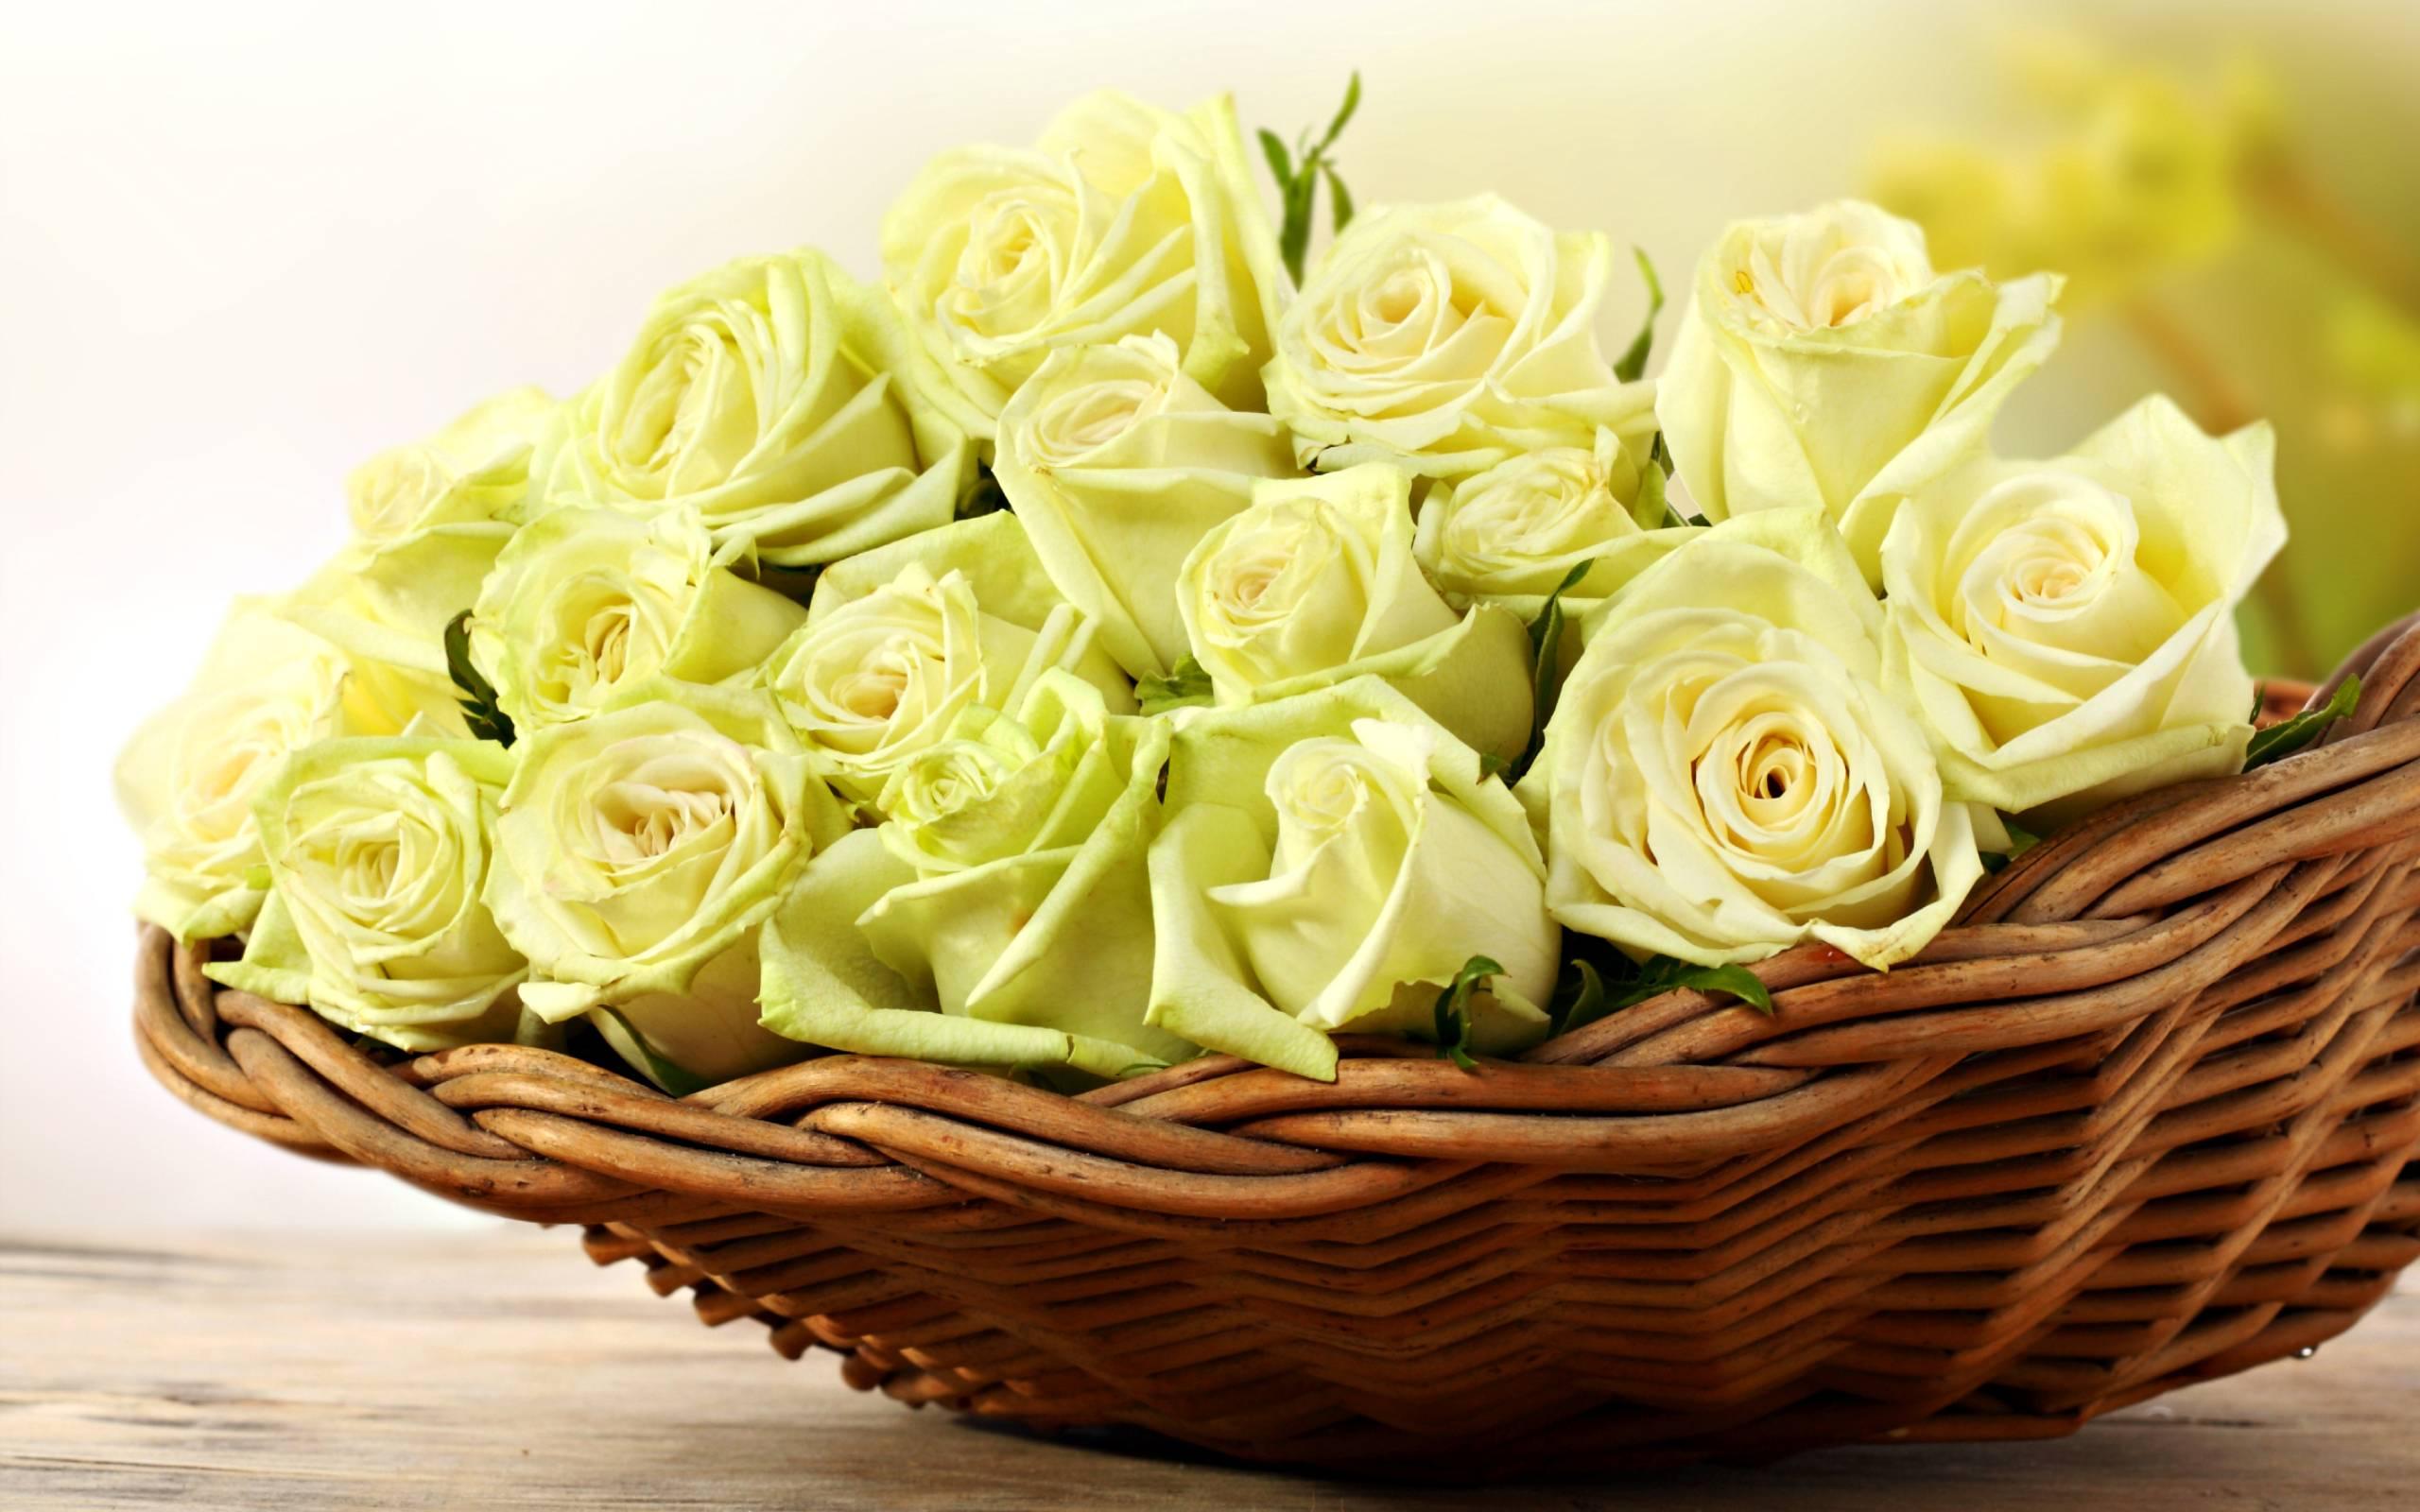 Hd wallpaper yellow rose - Hd Wallpapers 1080p Yellow Rose Hd Wallpapers Os